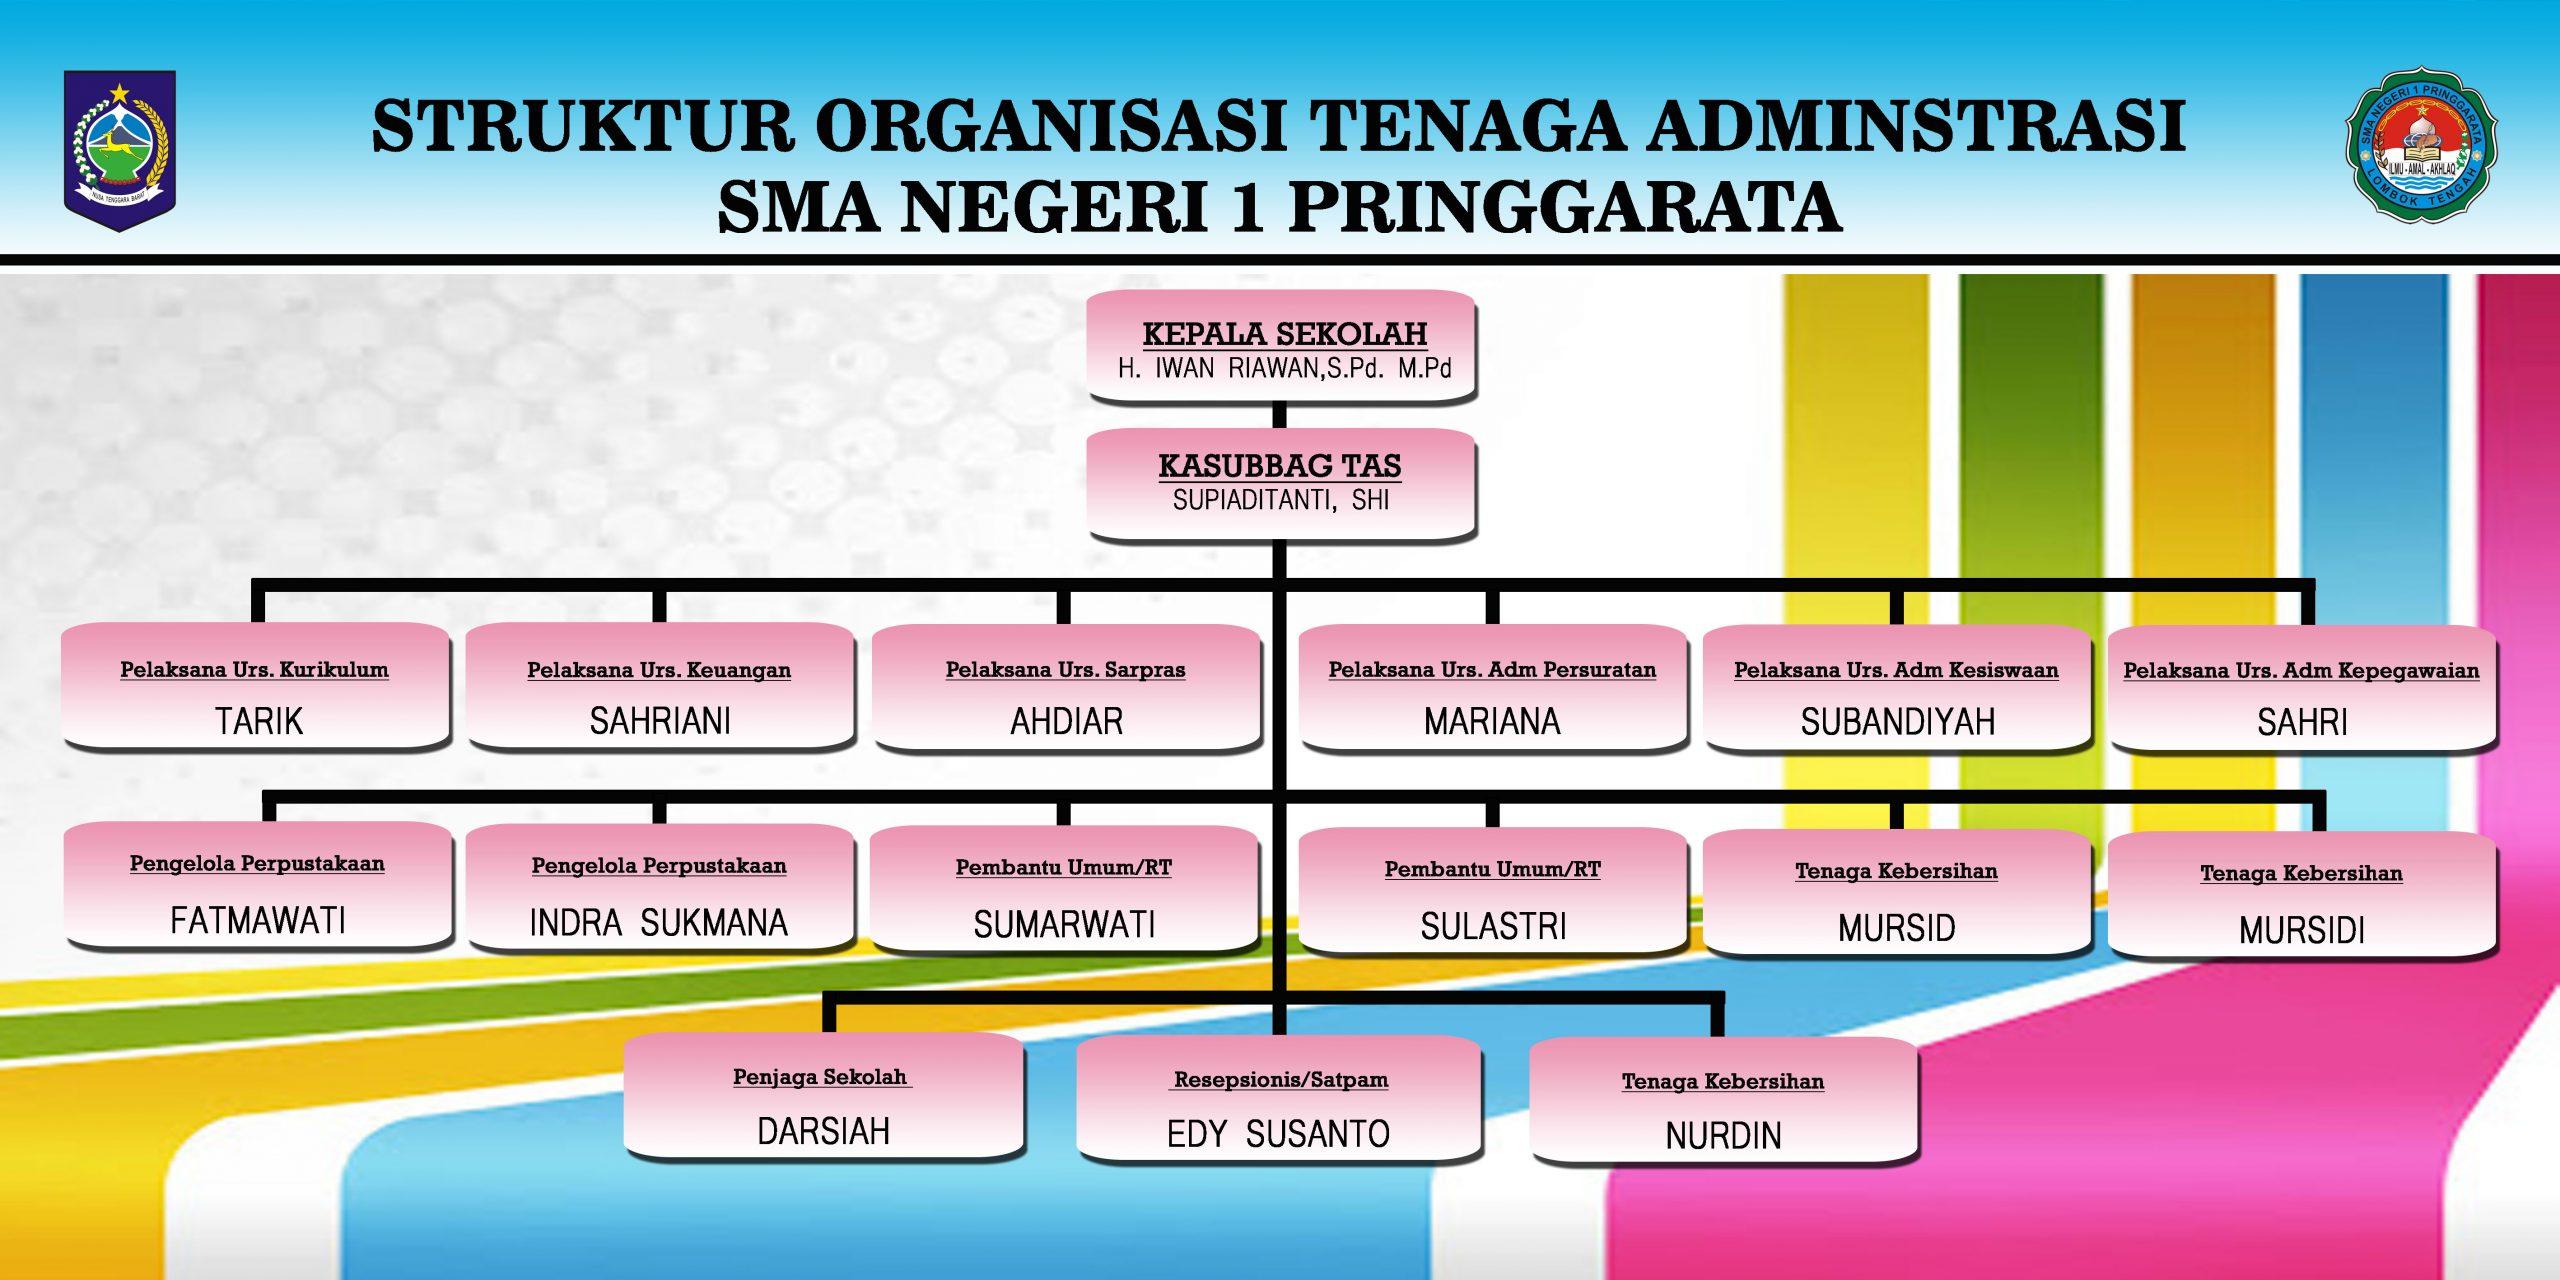 Struktur TU SMAN 1 Pringgarata